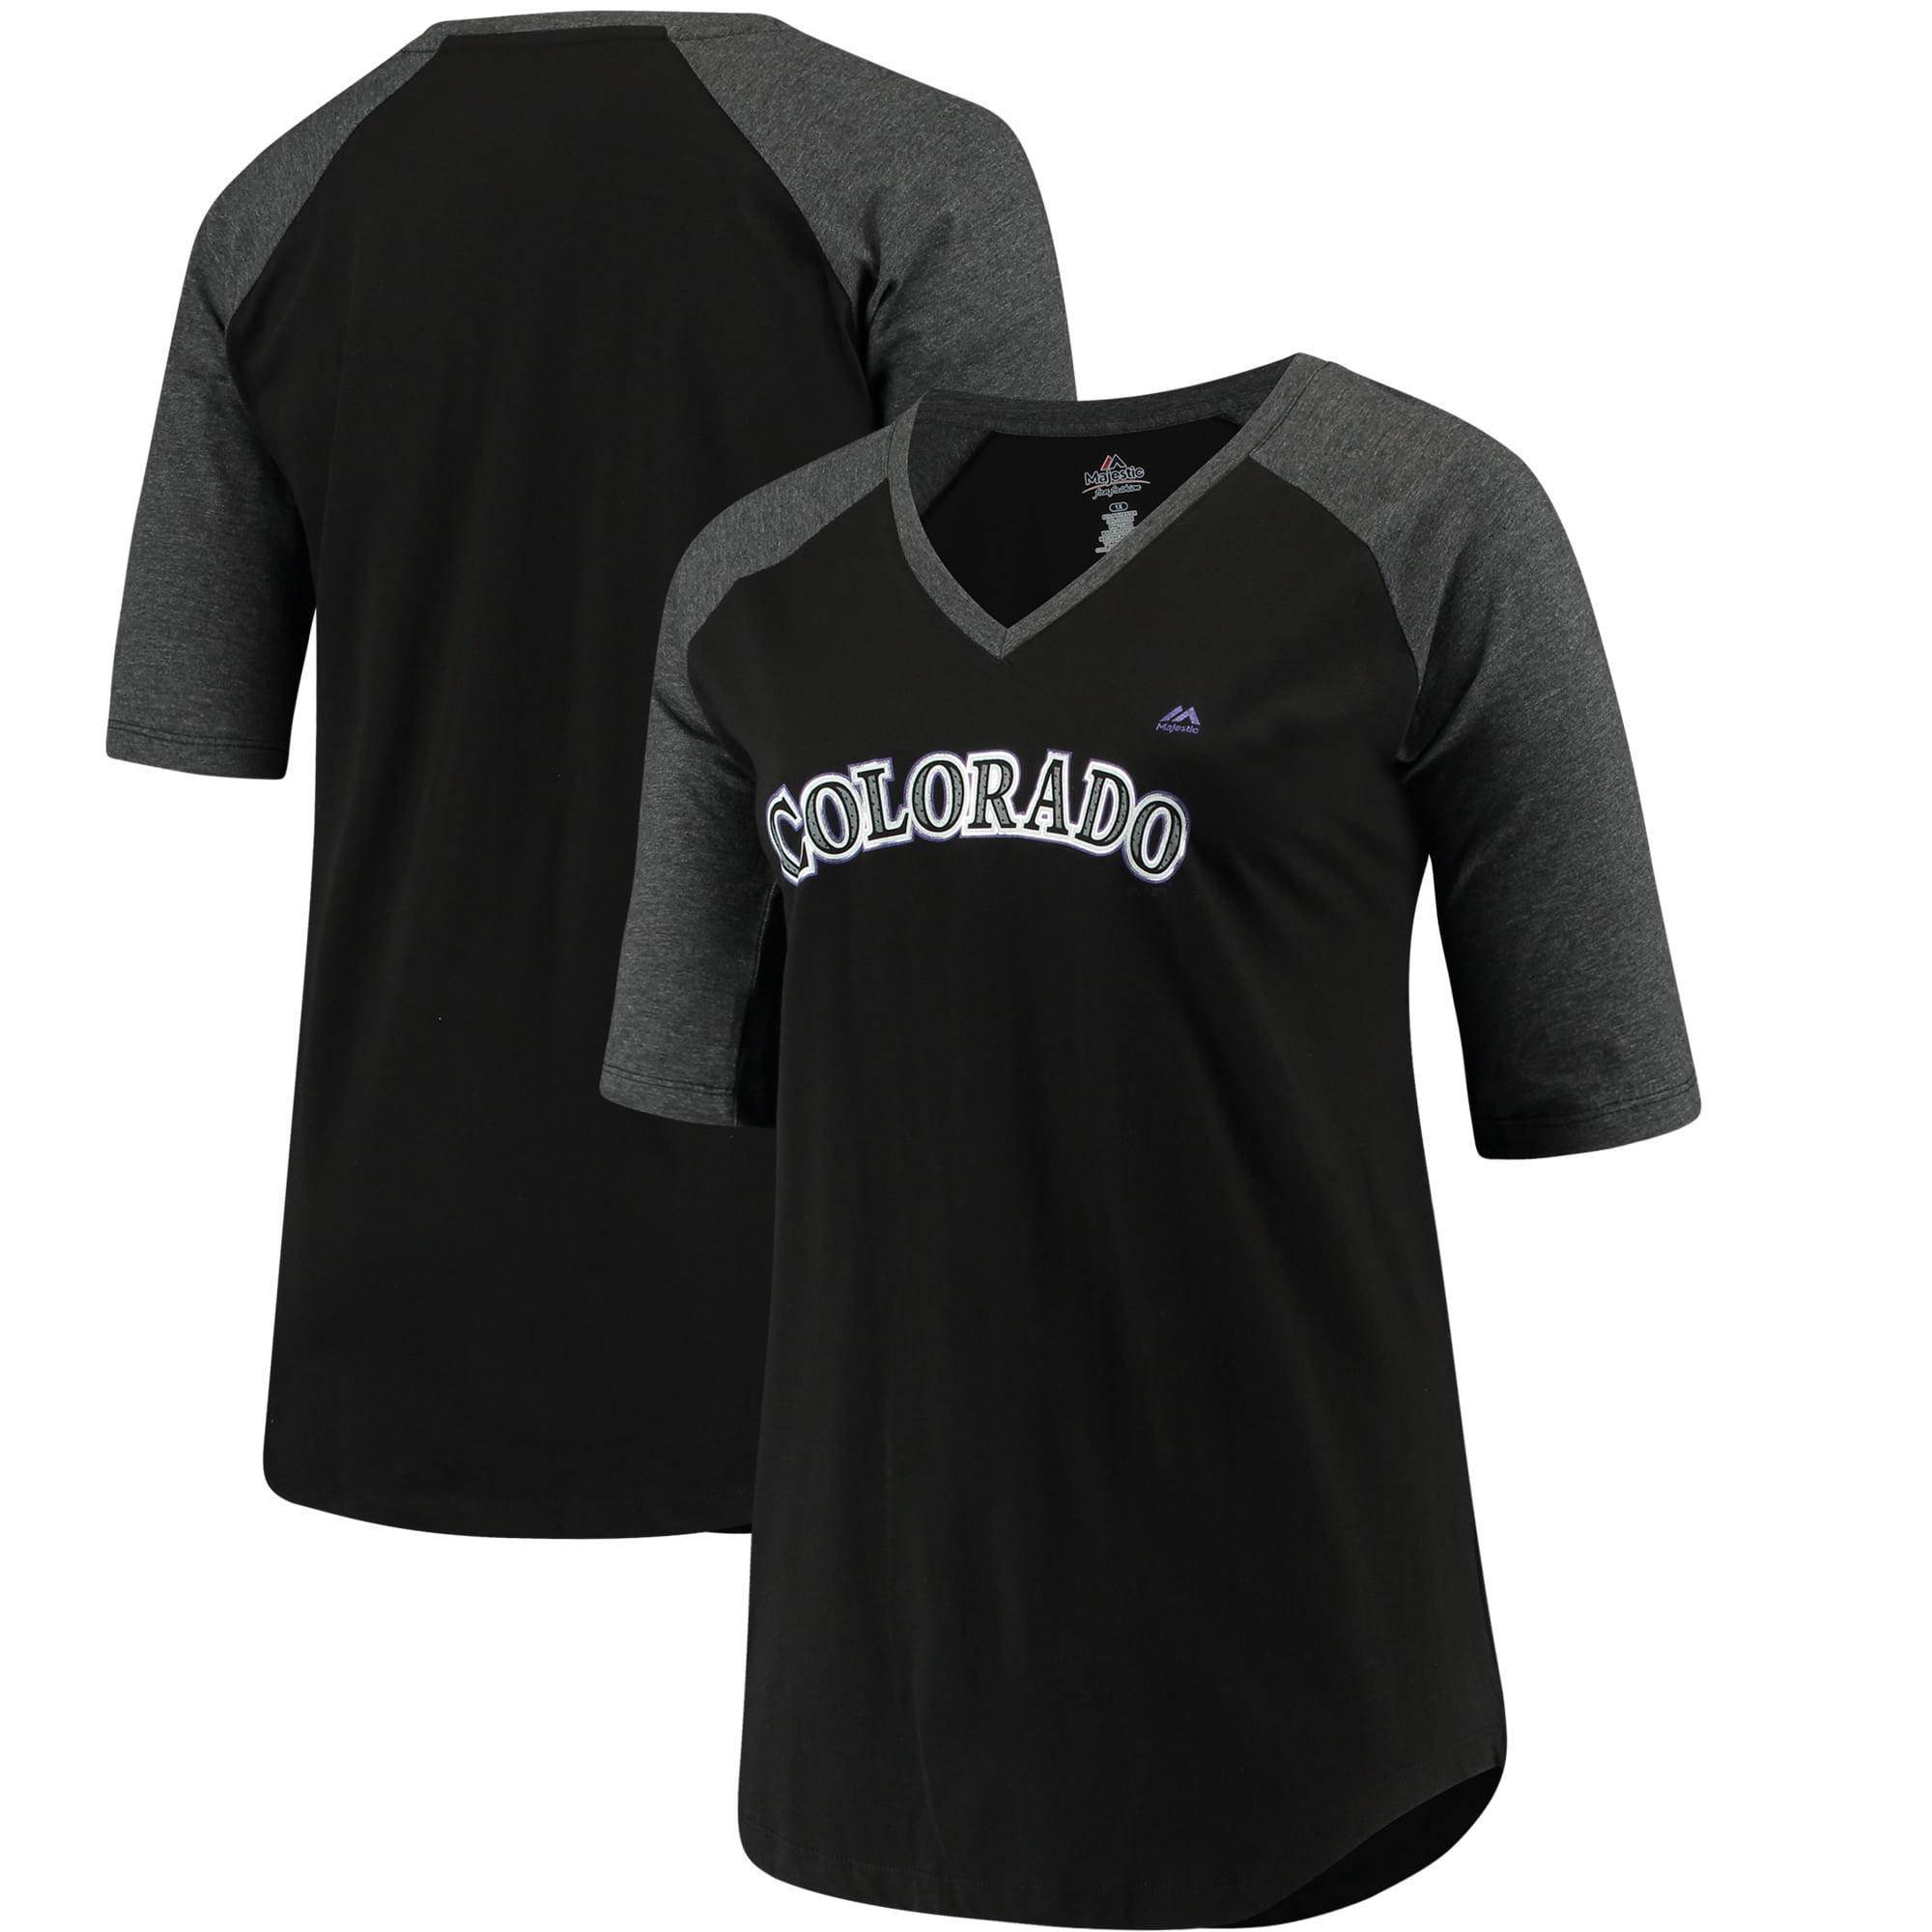 Colorado Rockies Majestic Women's Plus Size Quick Hands Half-Sleeve V-Neck T-Shirt - Black/Heathered Black